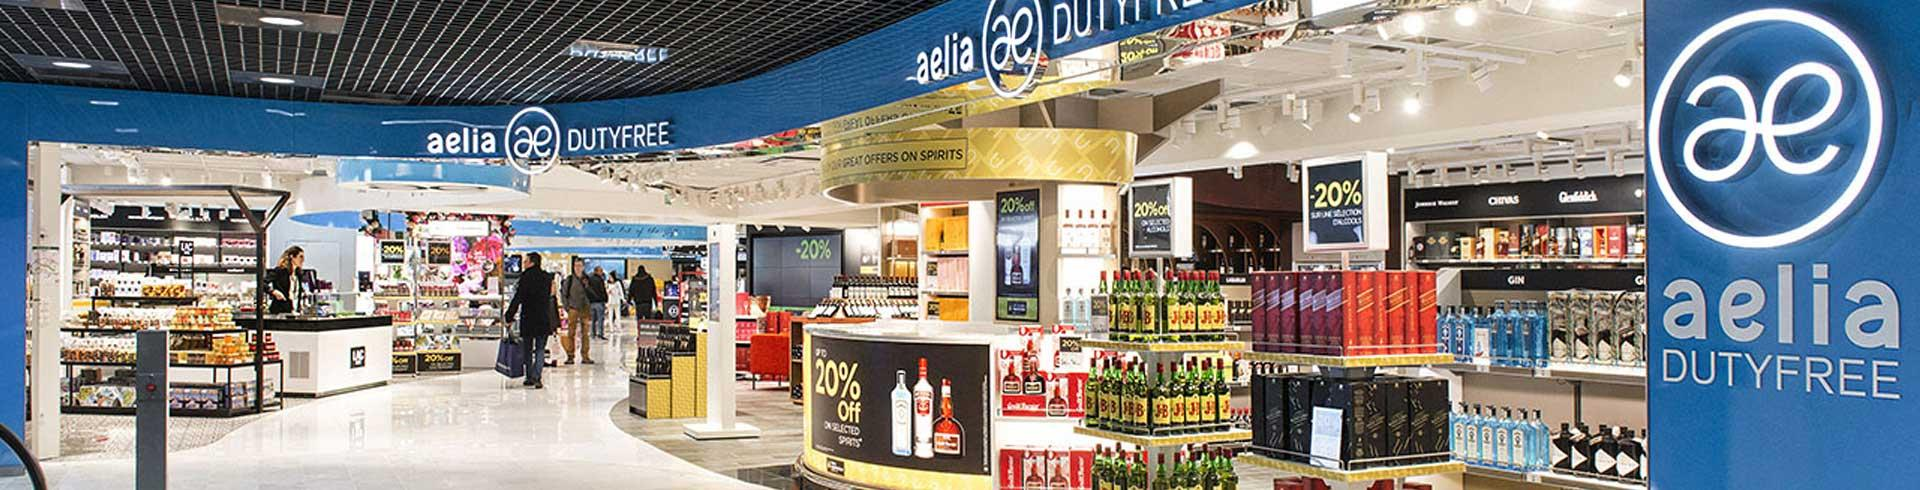 aelia duty free last minute alcools parfums terminal. Black Bedroom Furniture Sets. Home Design Ideas